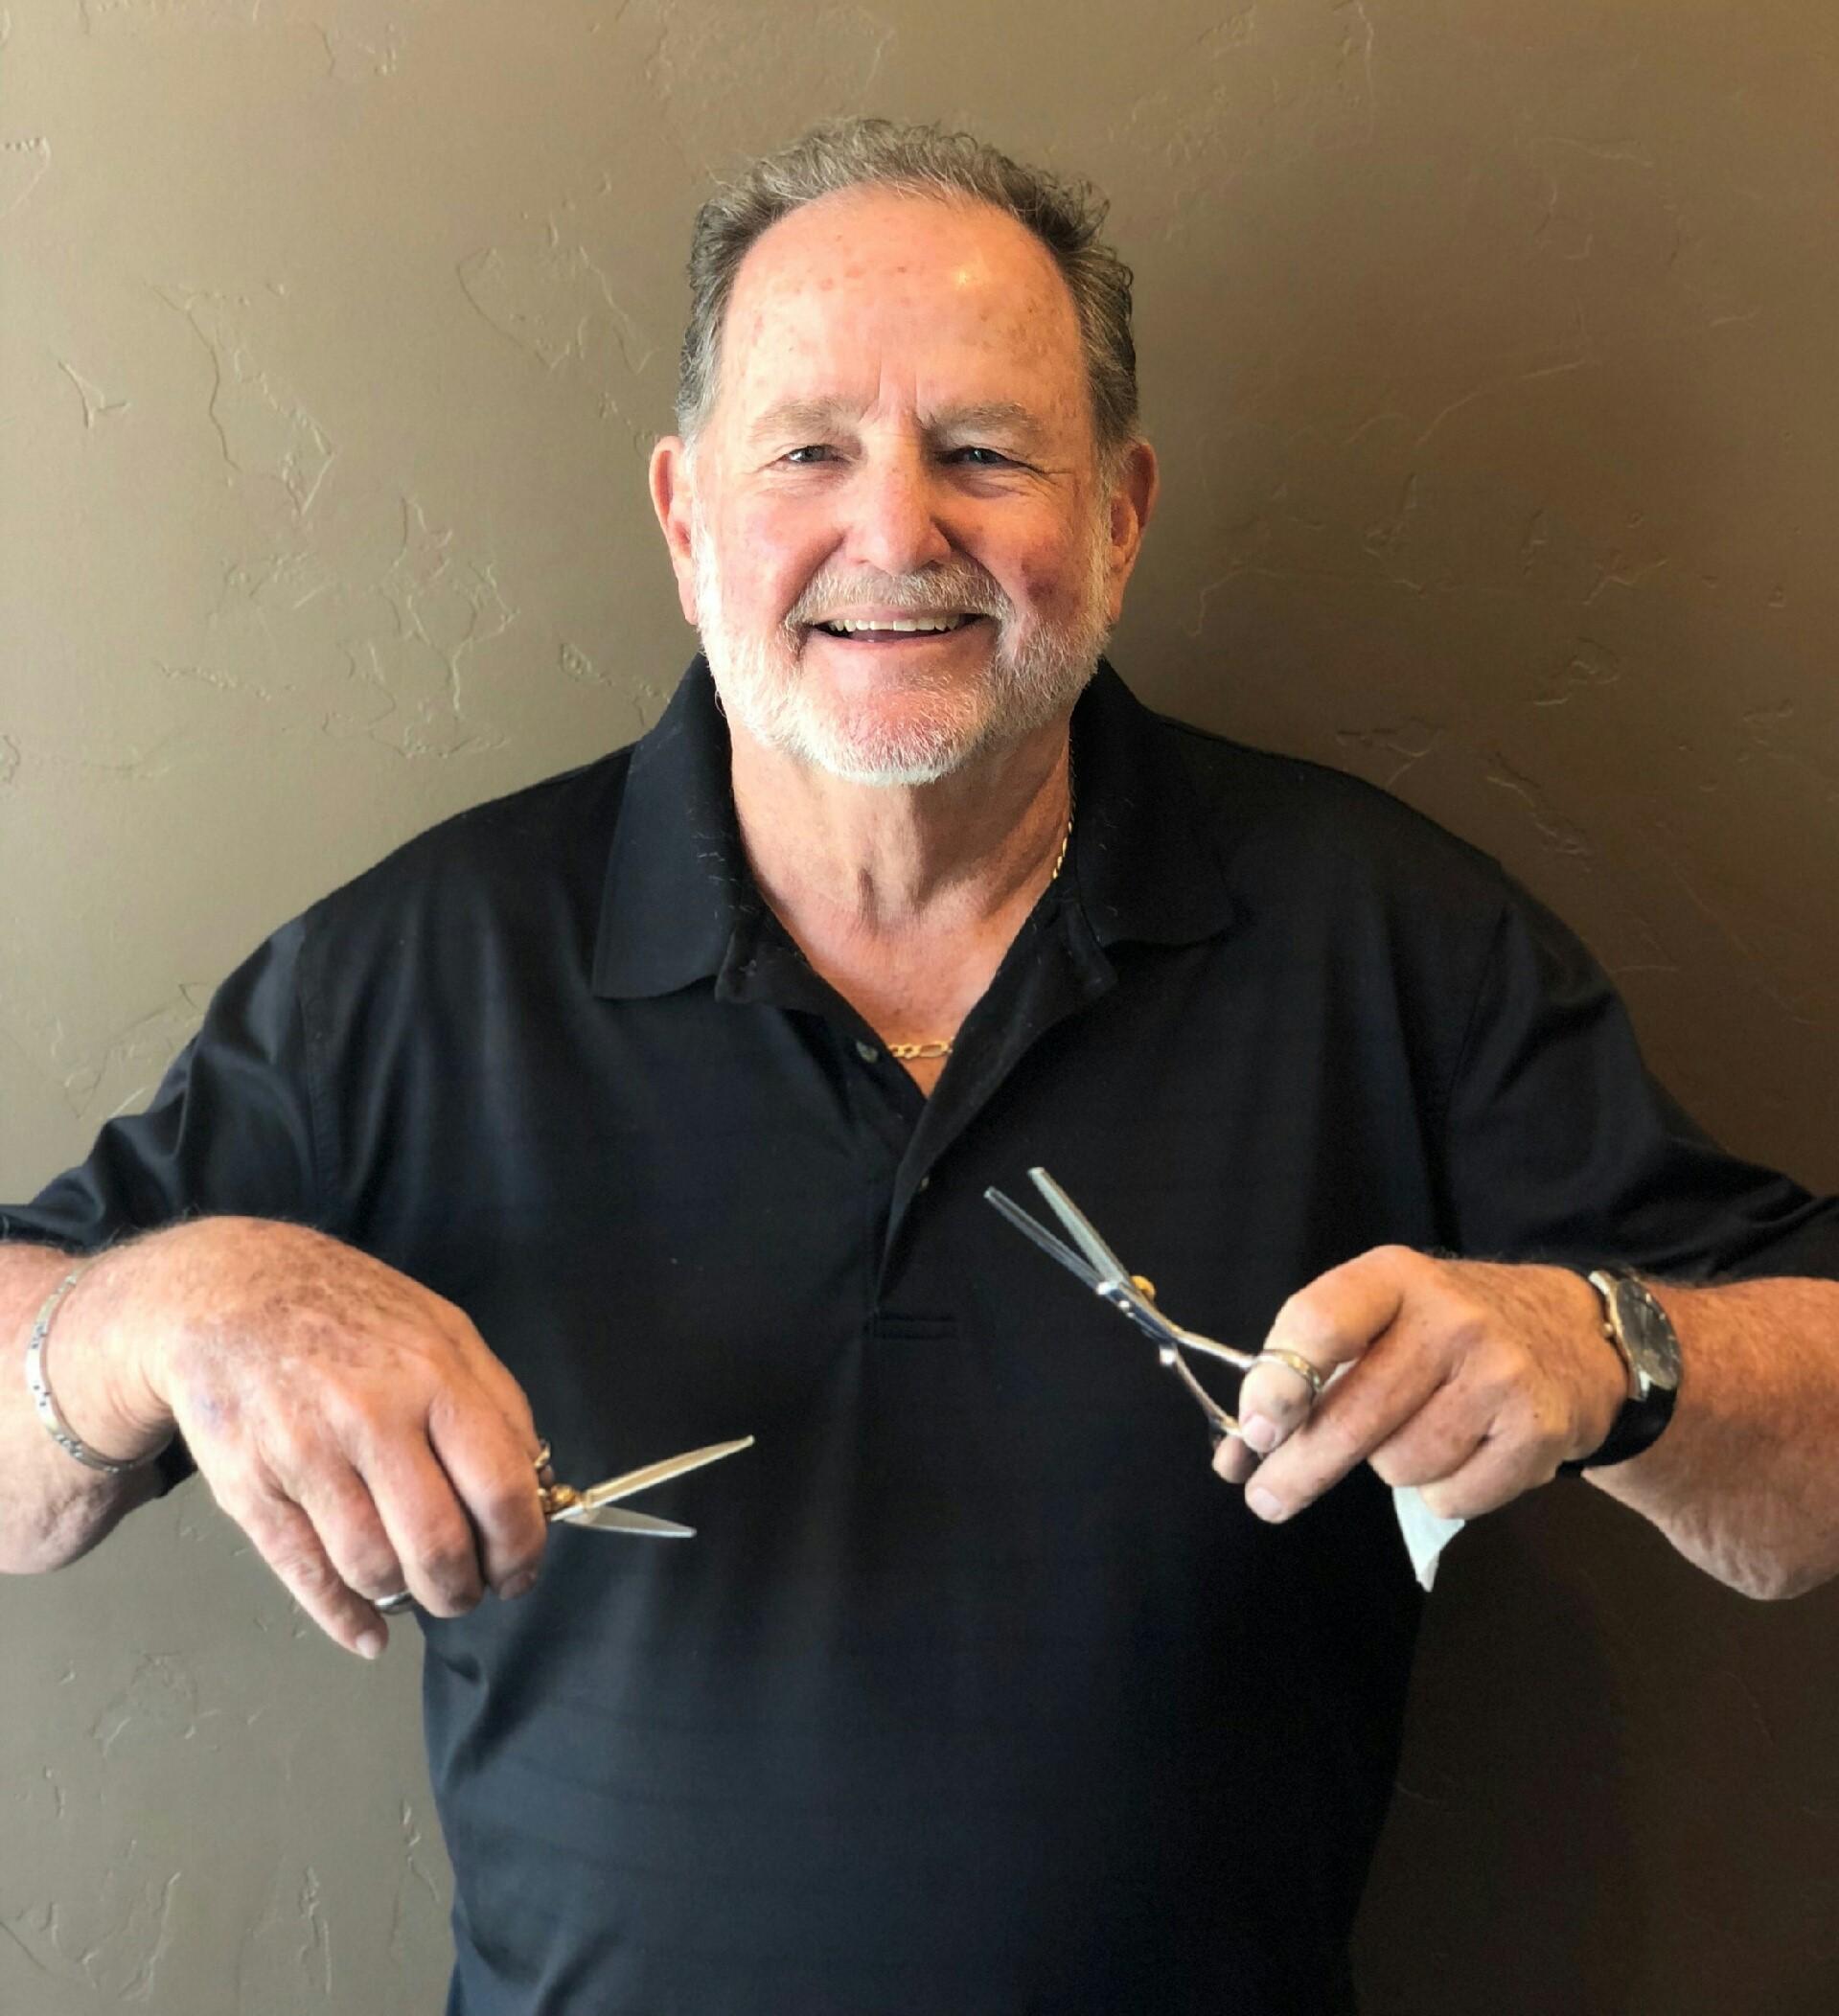 john-scott-j-s-products-scissor-salesman-sharpener-main-picture.jpg